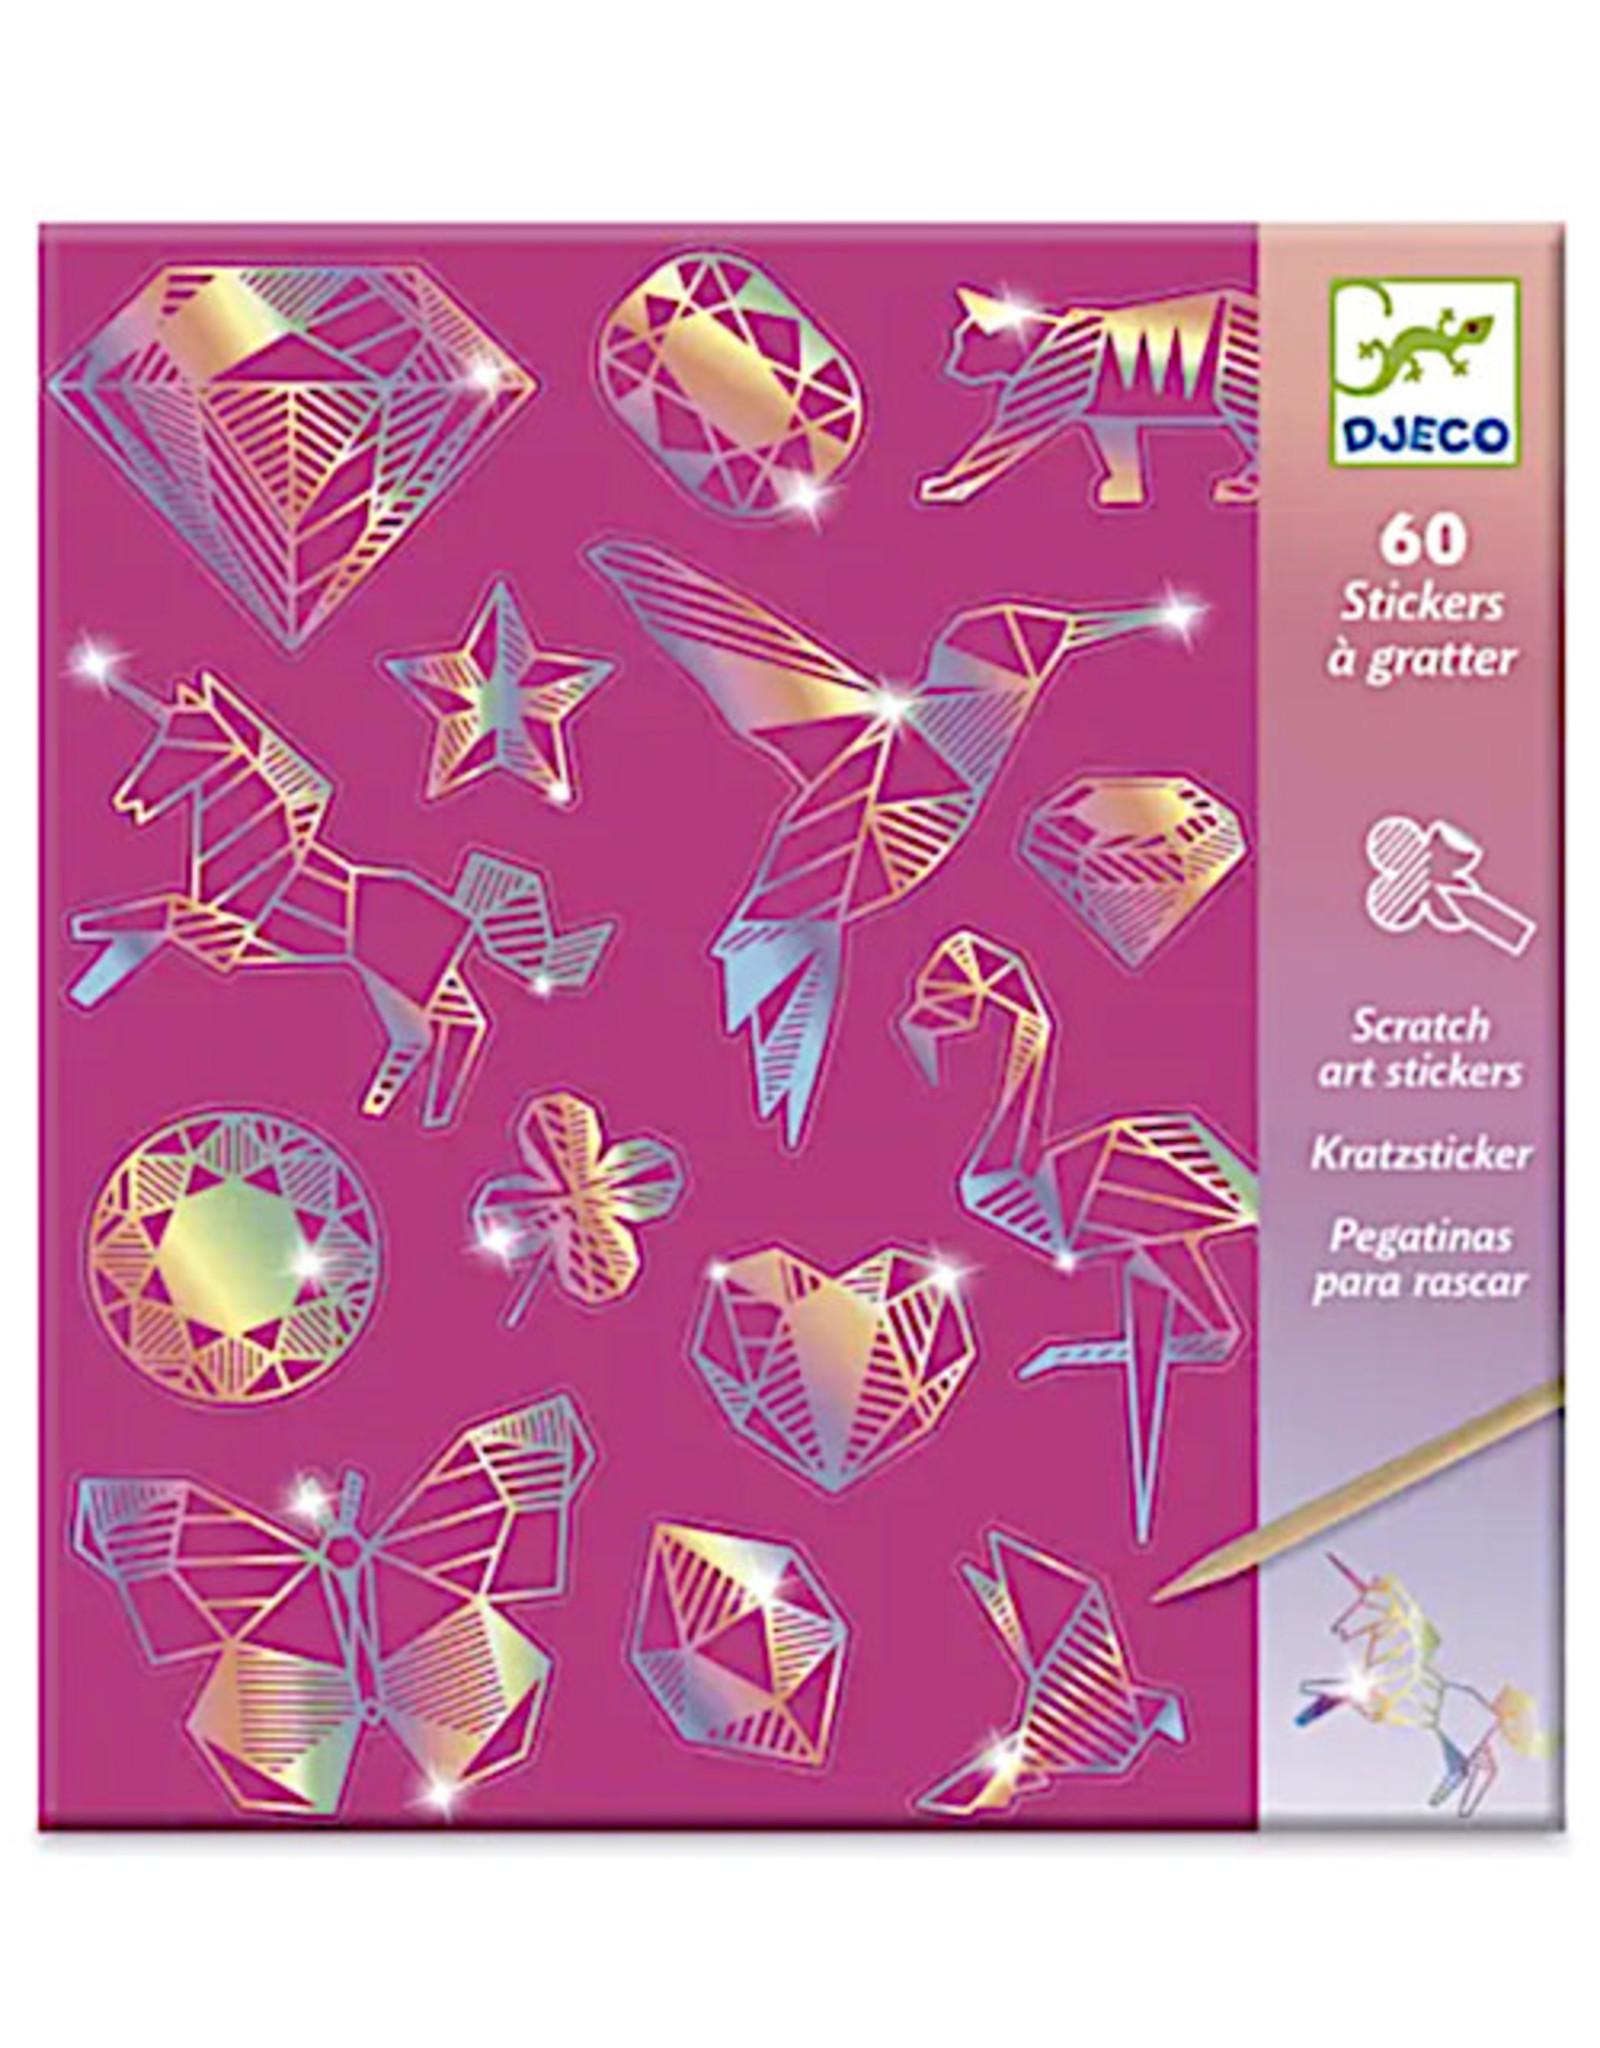 Djeco Diamond Holographic Sticker Scratch Art Activity Set